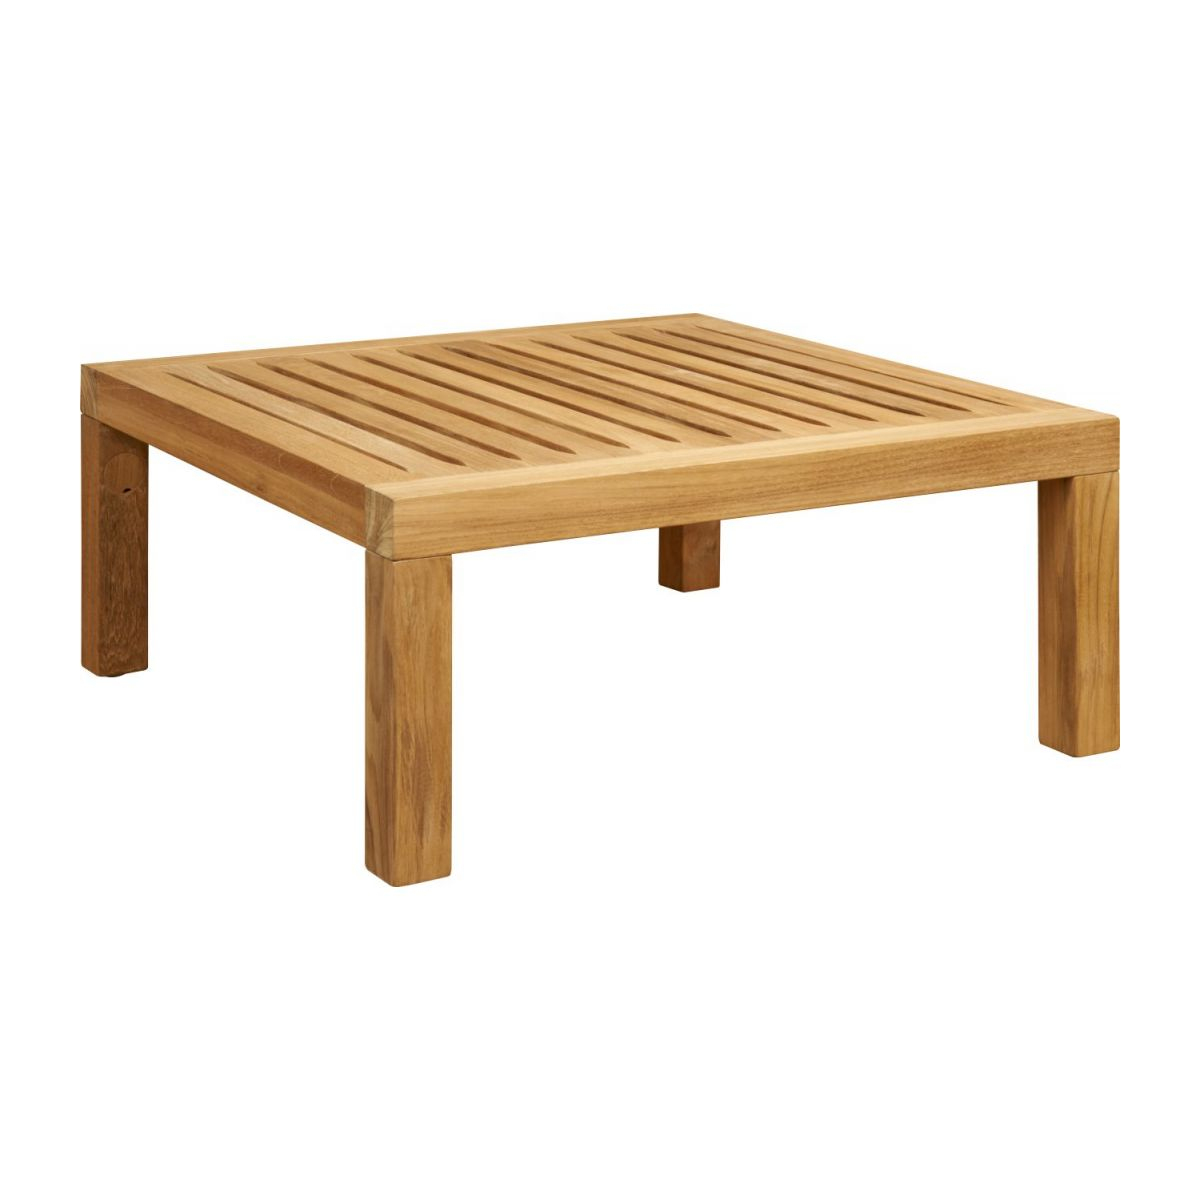 Table Basse De Jardin En Teck -Naturel - 70 X 70 Cm concernant Table De Jardin Carre